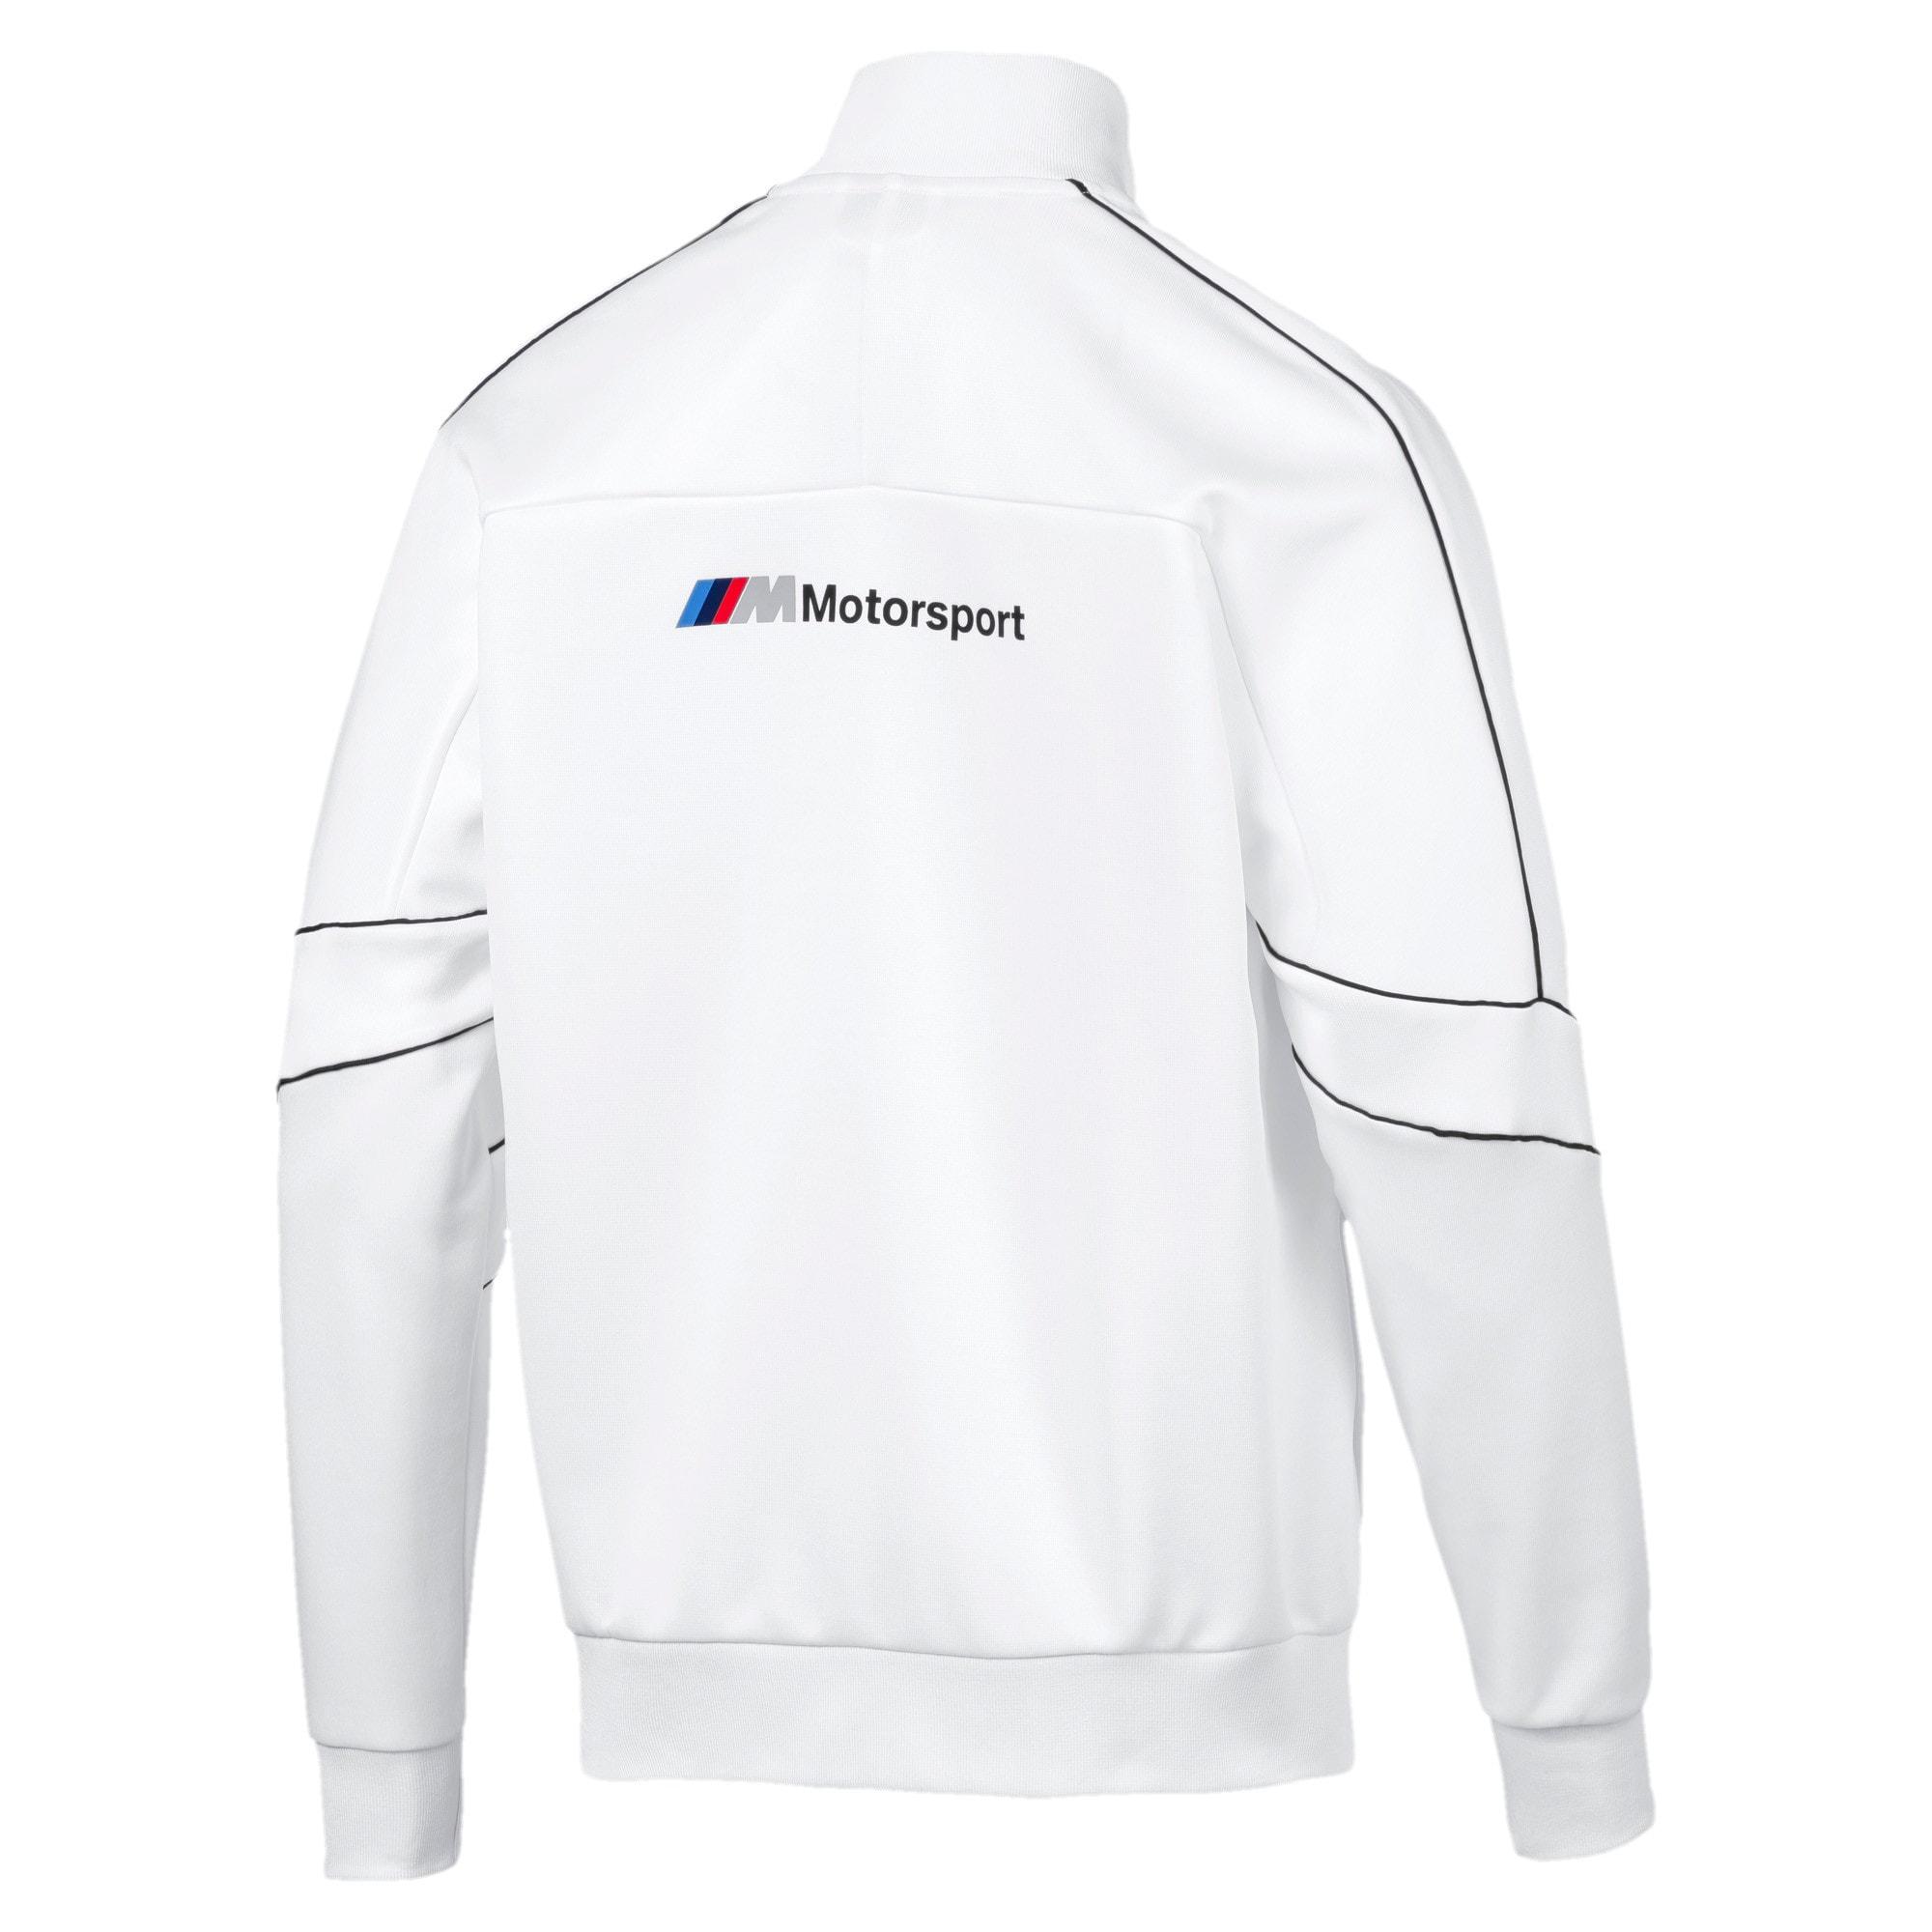 Thumbnail 2 of BMW M Motorsport Men's T7 Track Jacket, Puma White, medium